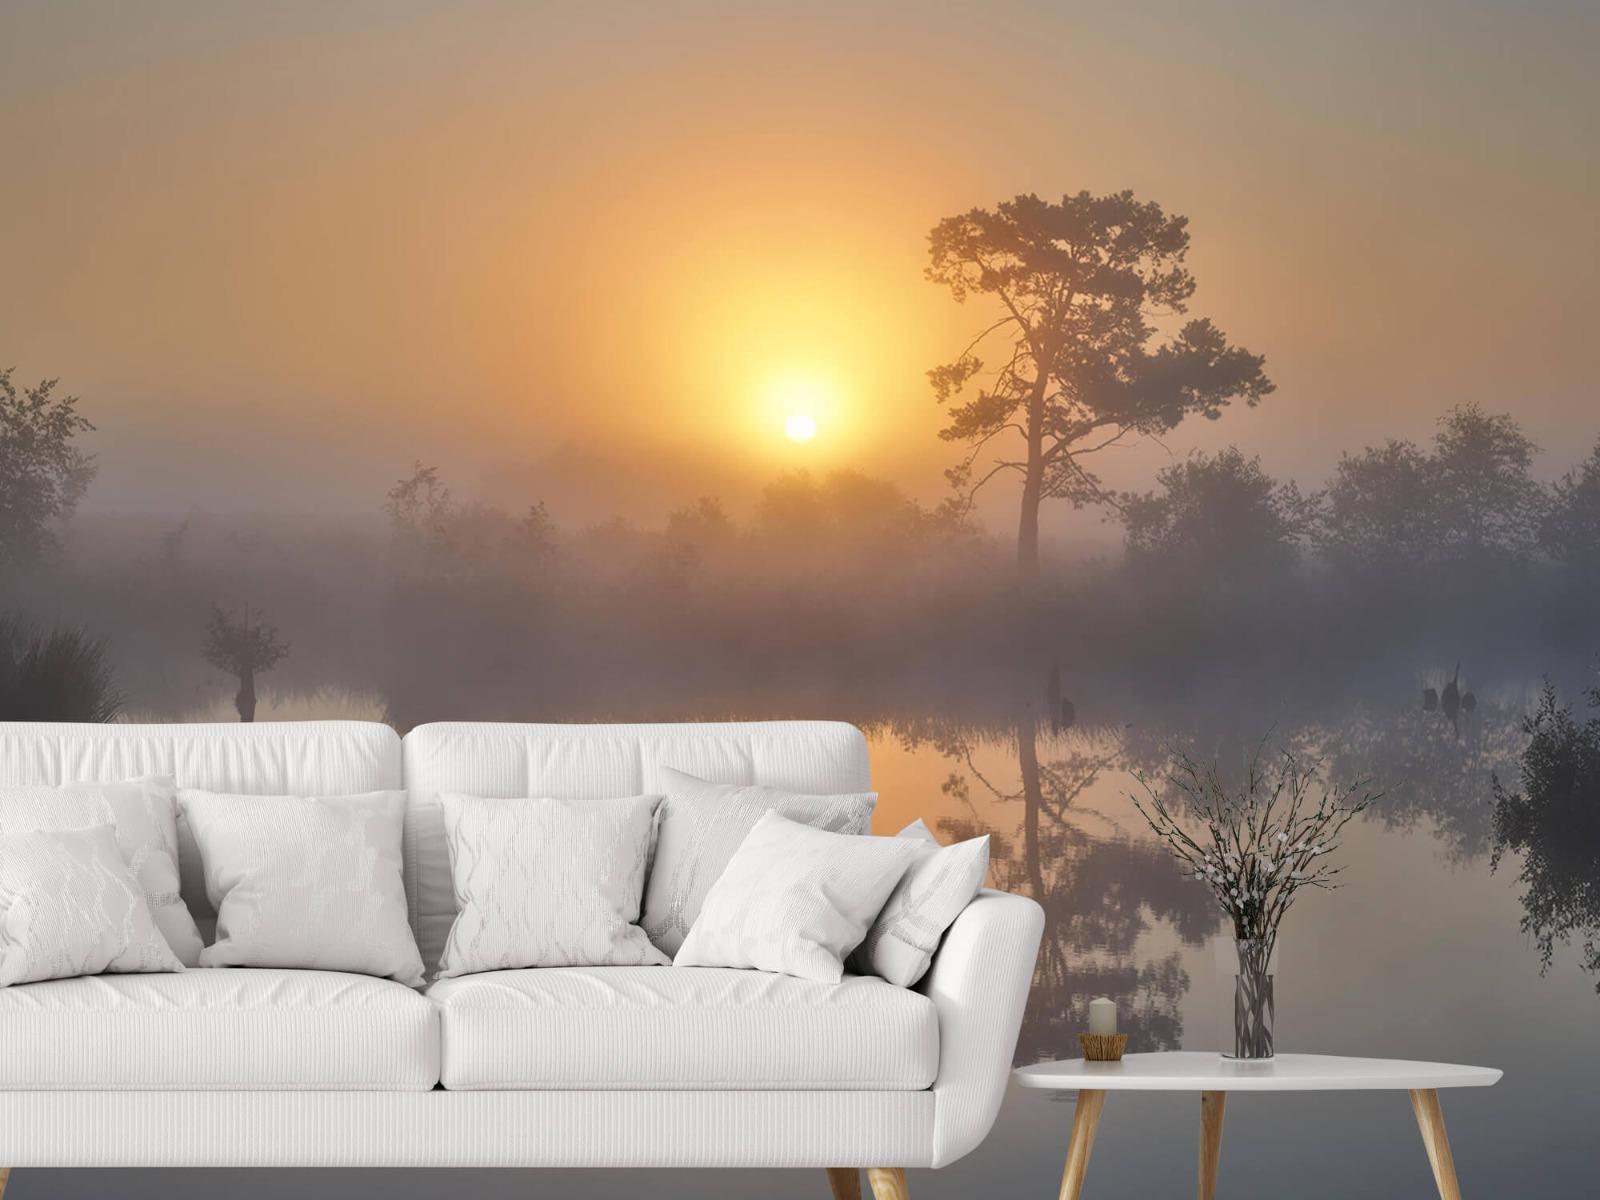 Natuur - Mistige zonsopkomst 4